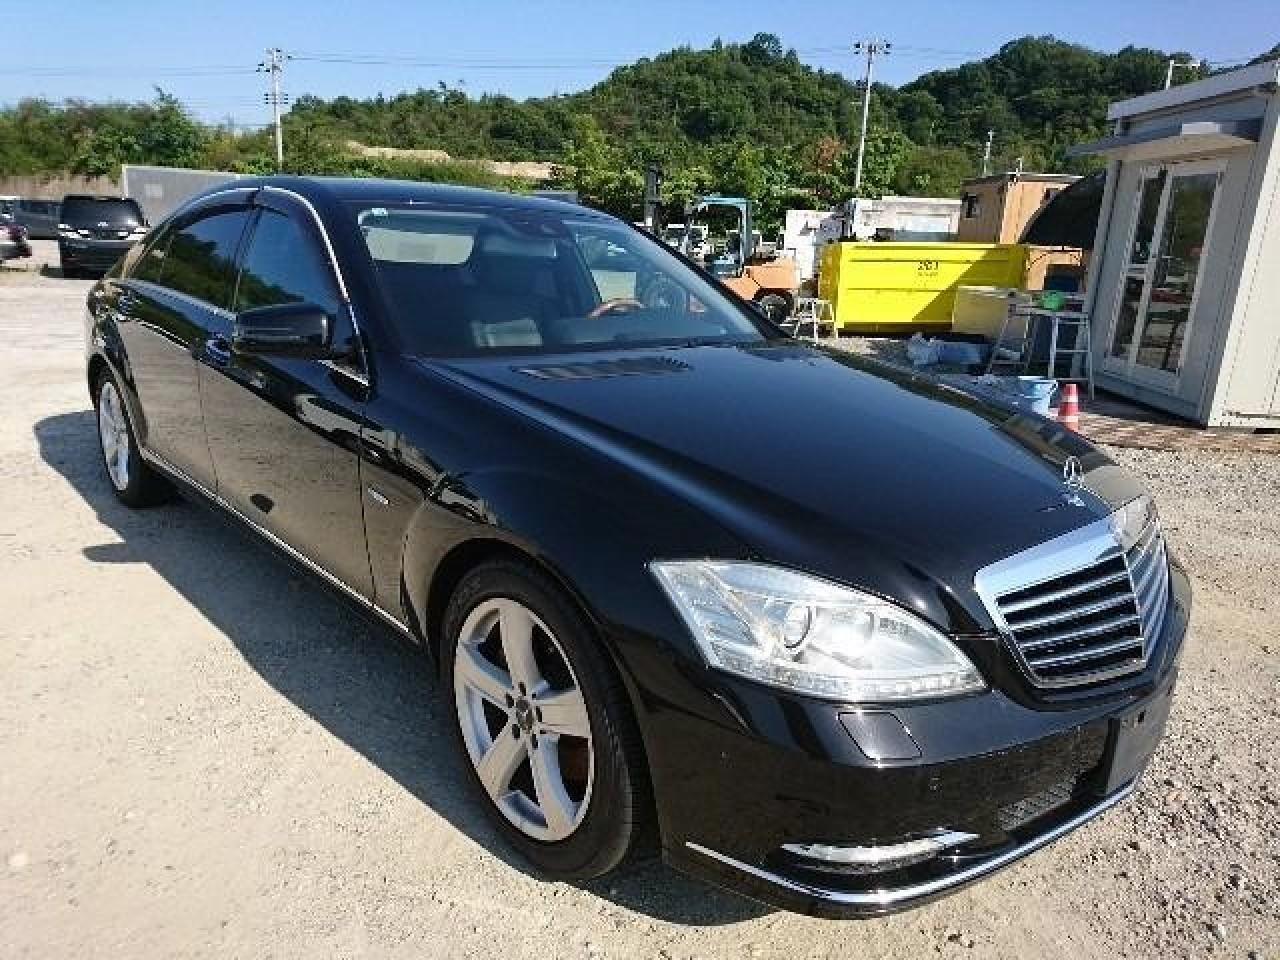 Mercedes-Benz C-Class, Carros, Bolama